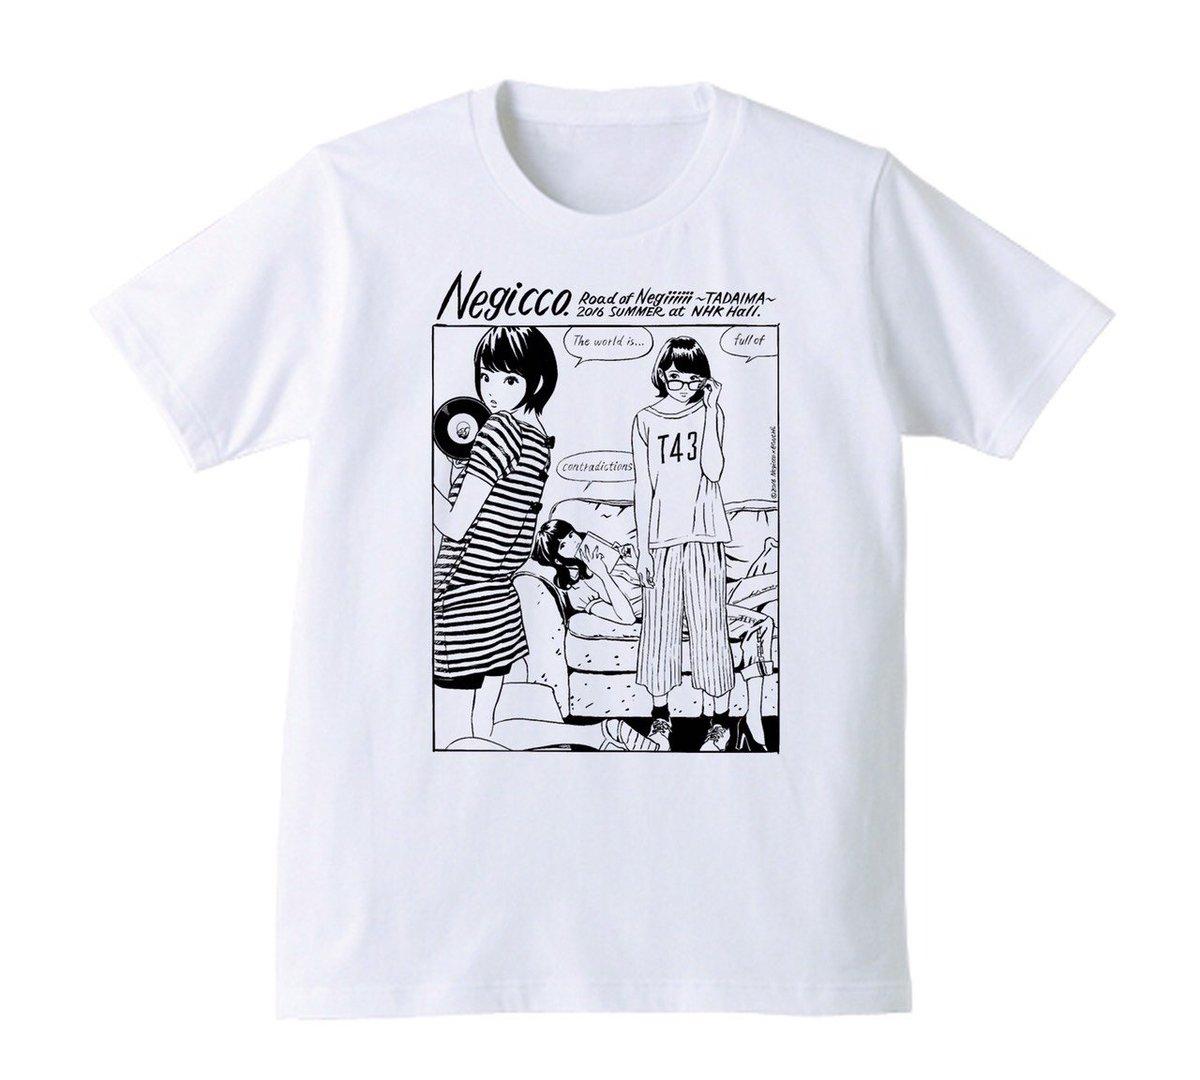 NHKホールワンマンのグッズを「Negi Goods Store」での先行販売中! 江口寿史×Negicco Tシャツとトートの画像アップしました! https://t.co/0XMaBNhIQV https://t.co/WvvPM7RUxV